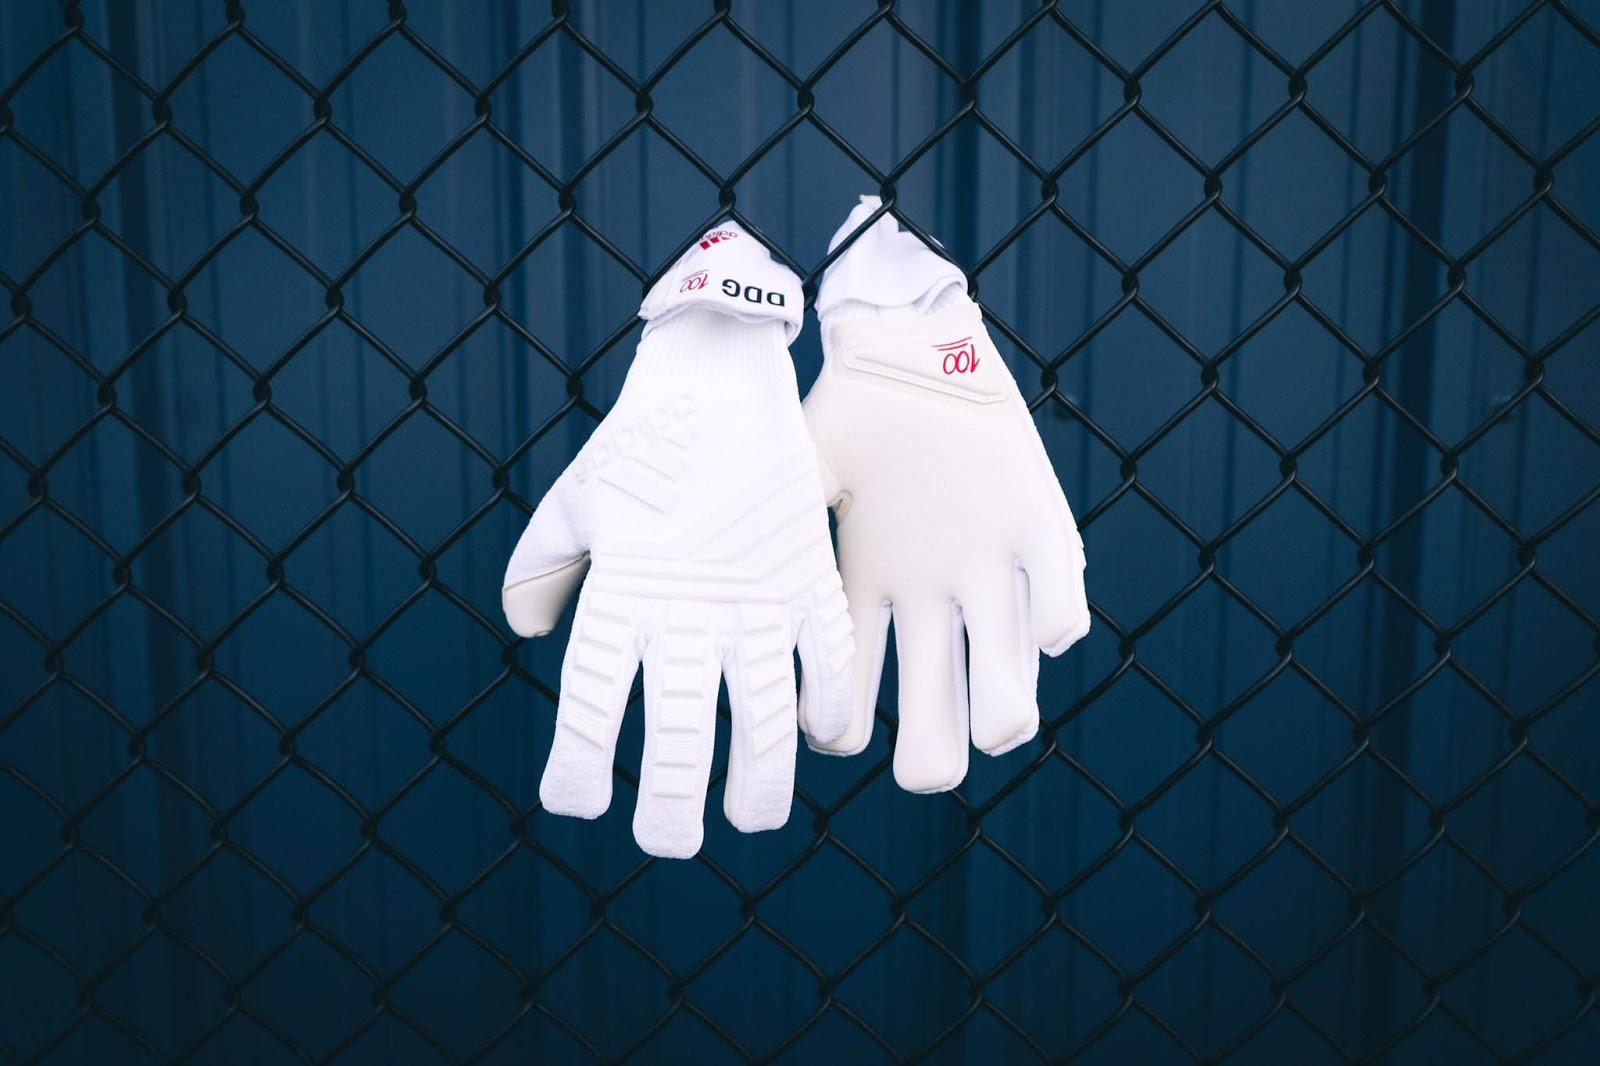 online store 9f0e9 bdffc Special Adidas David de Gea '100' Keeper Gloves Released ...